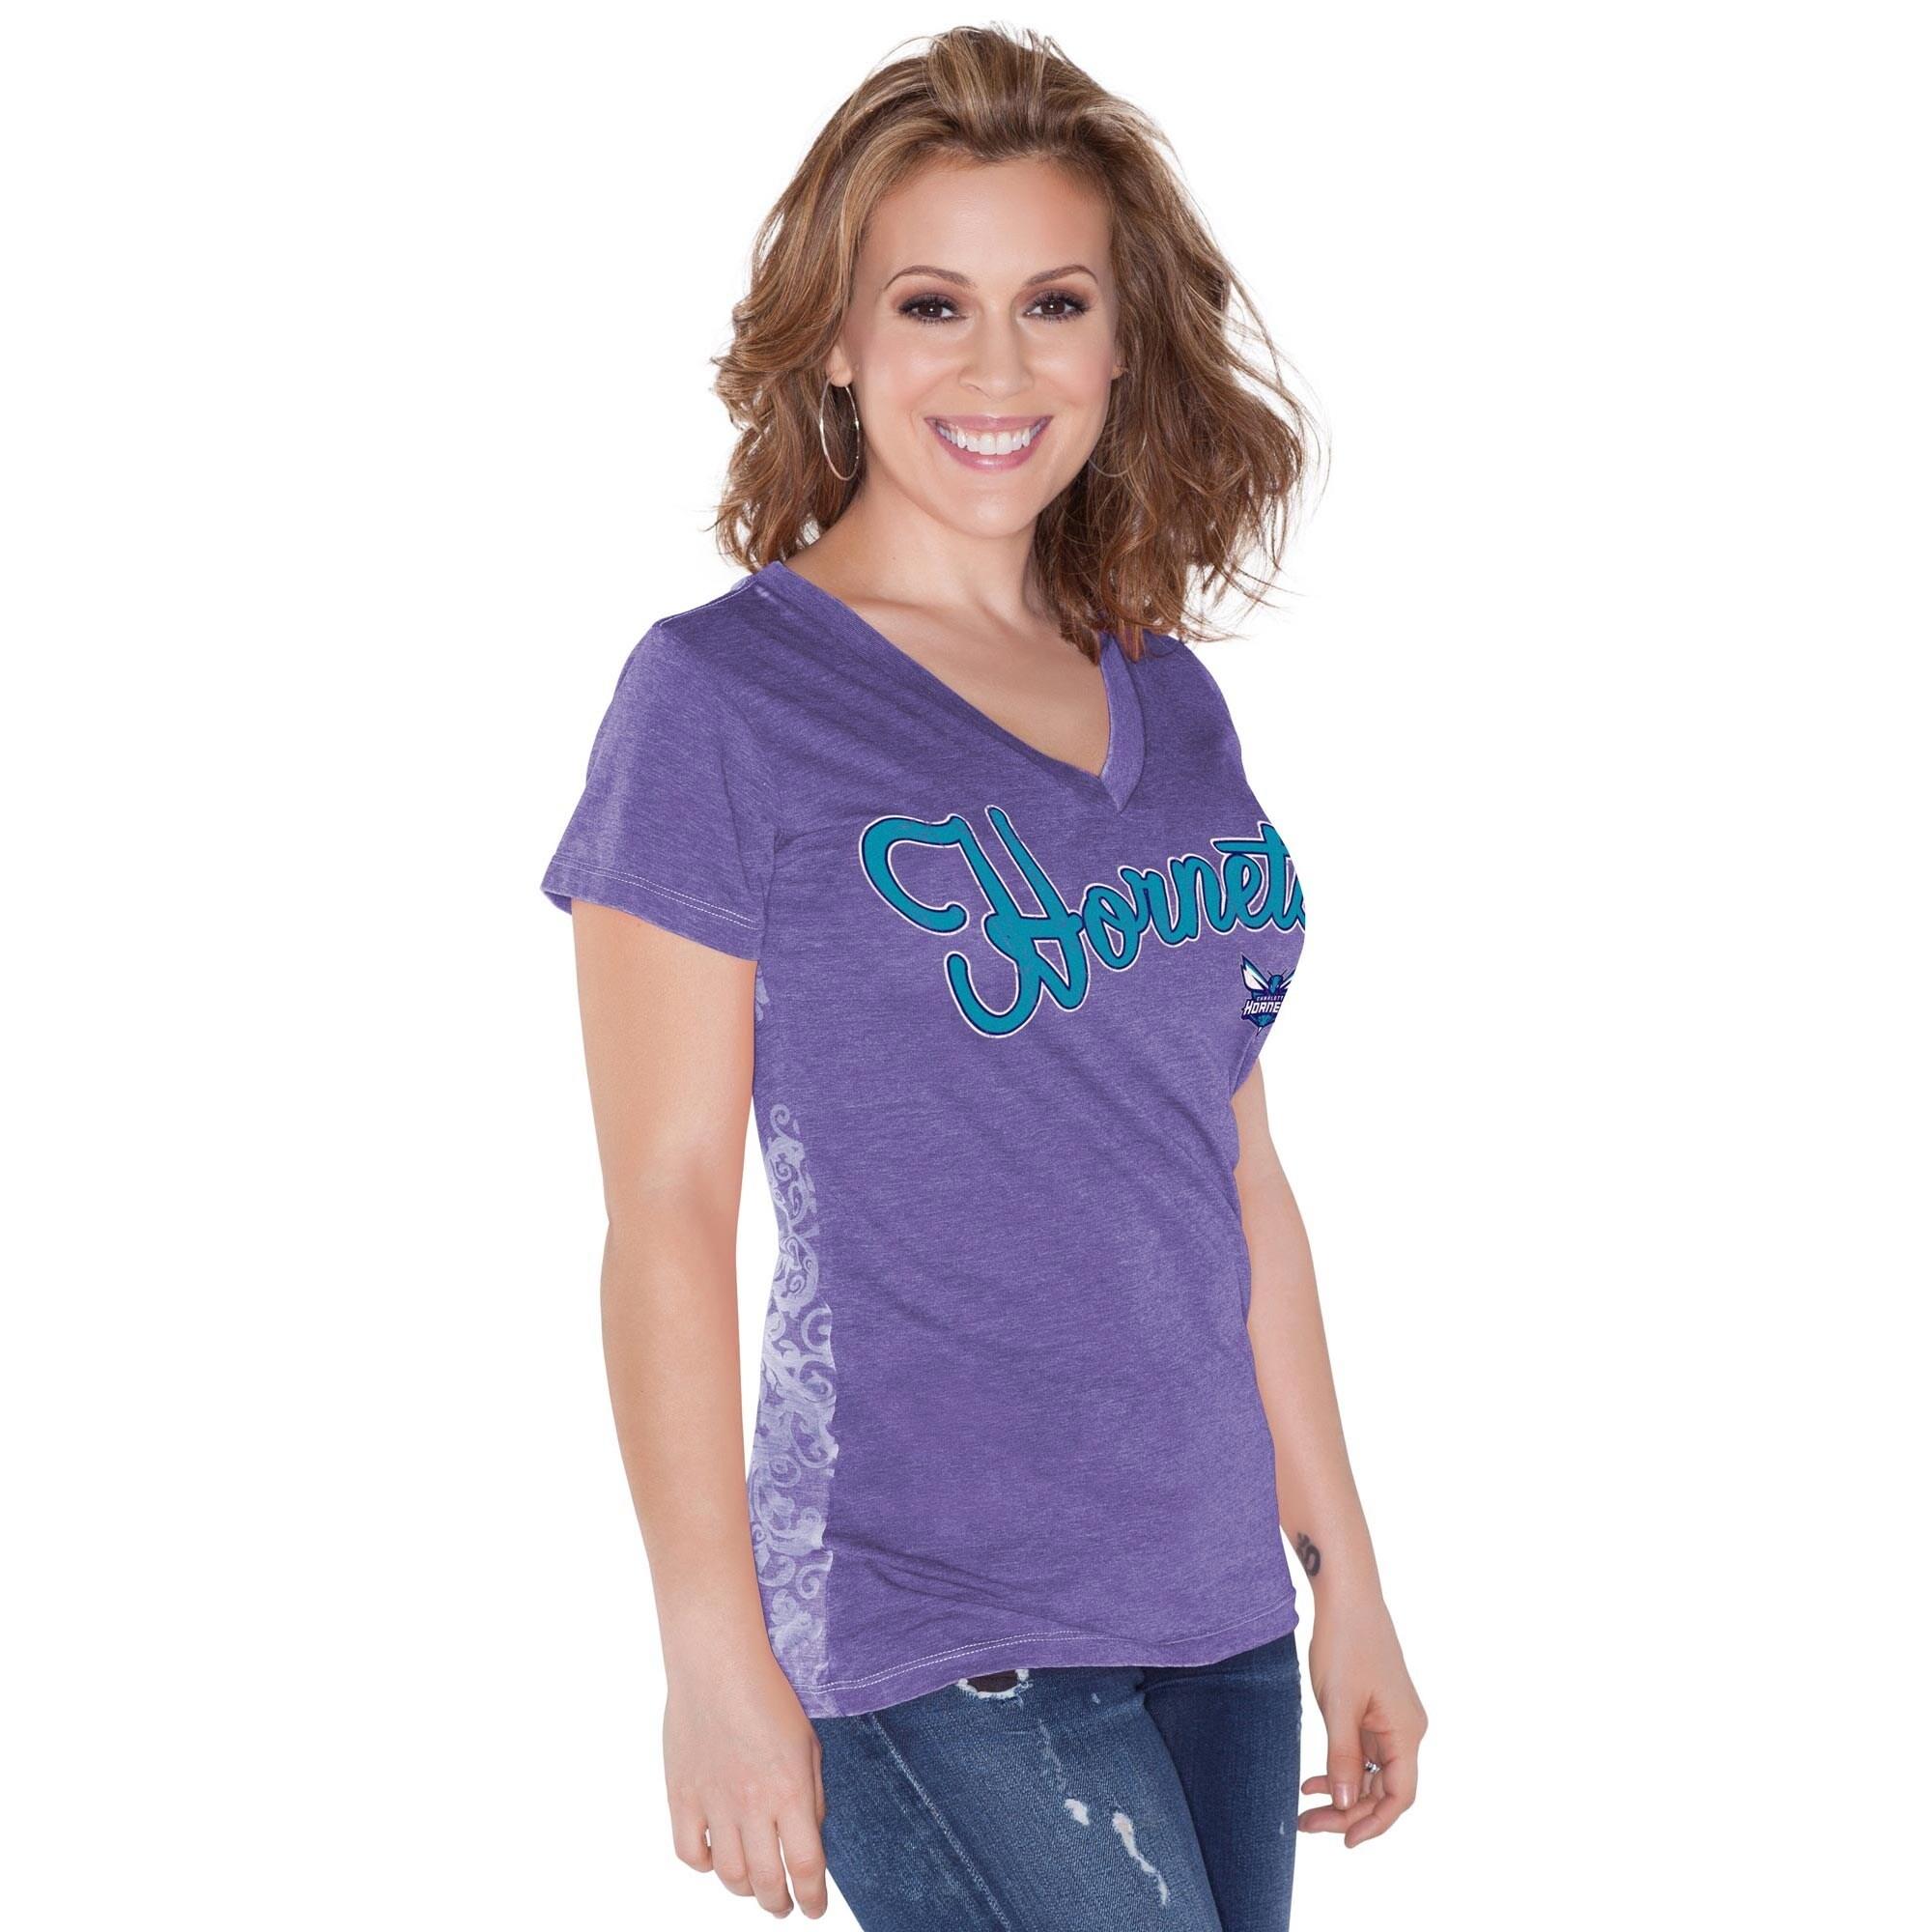 Charlotte Hornets Touch by Alyssa Milano Women's Audrey V-Neck T-Shirt - Purple